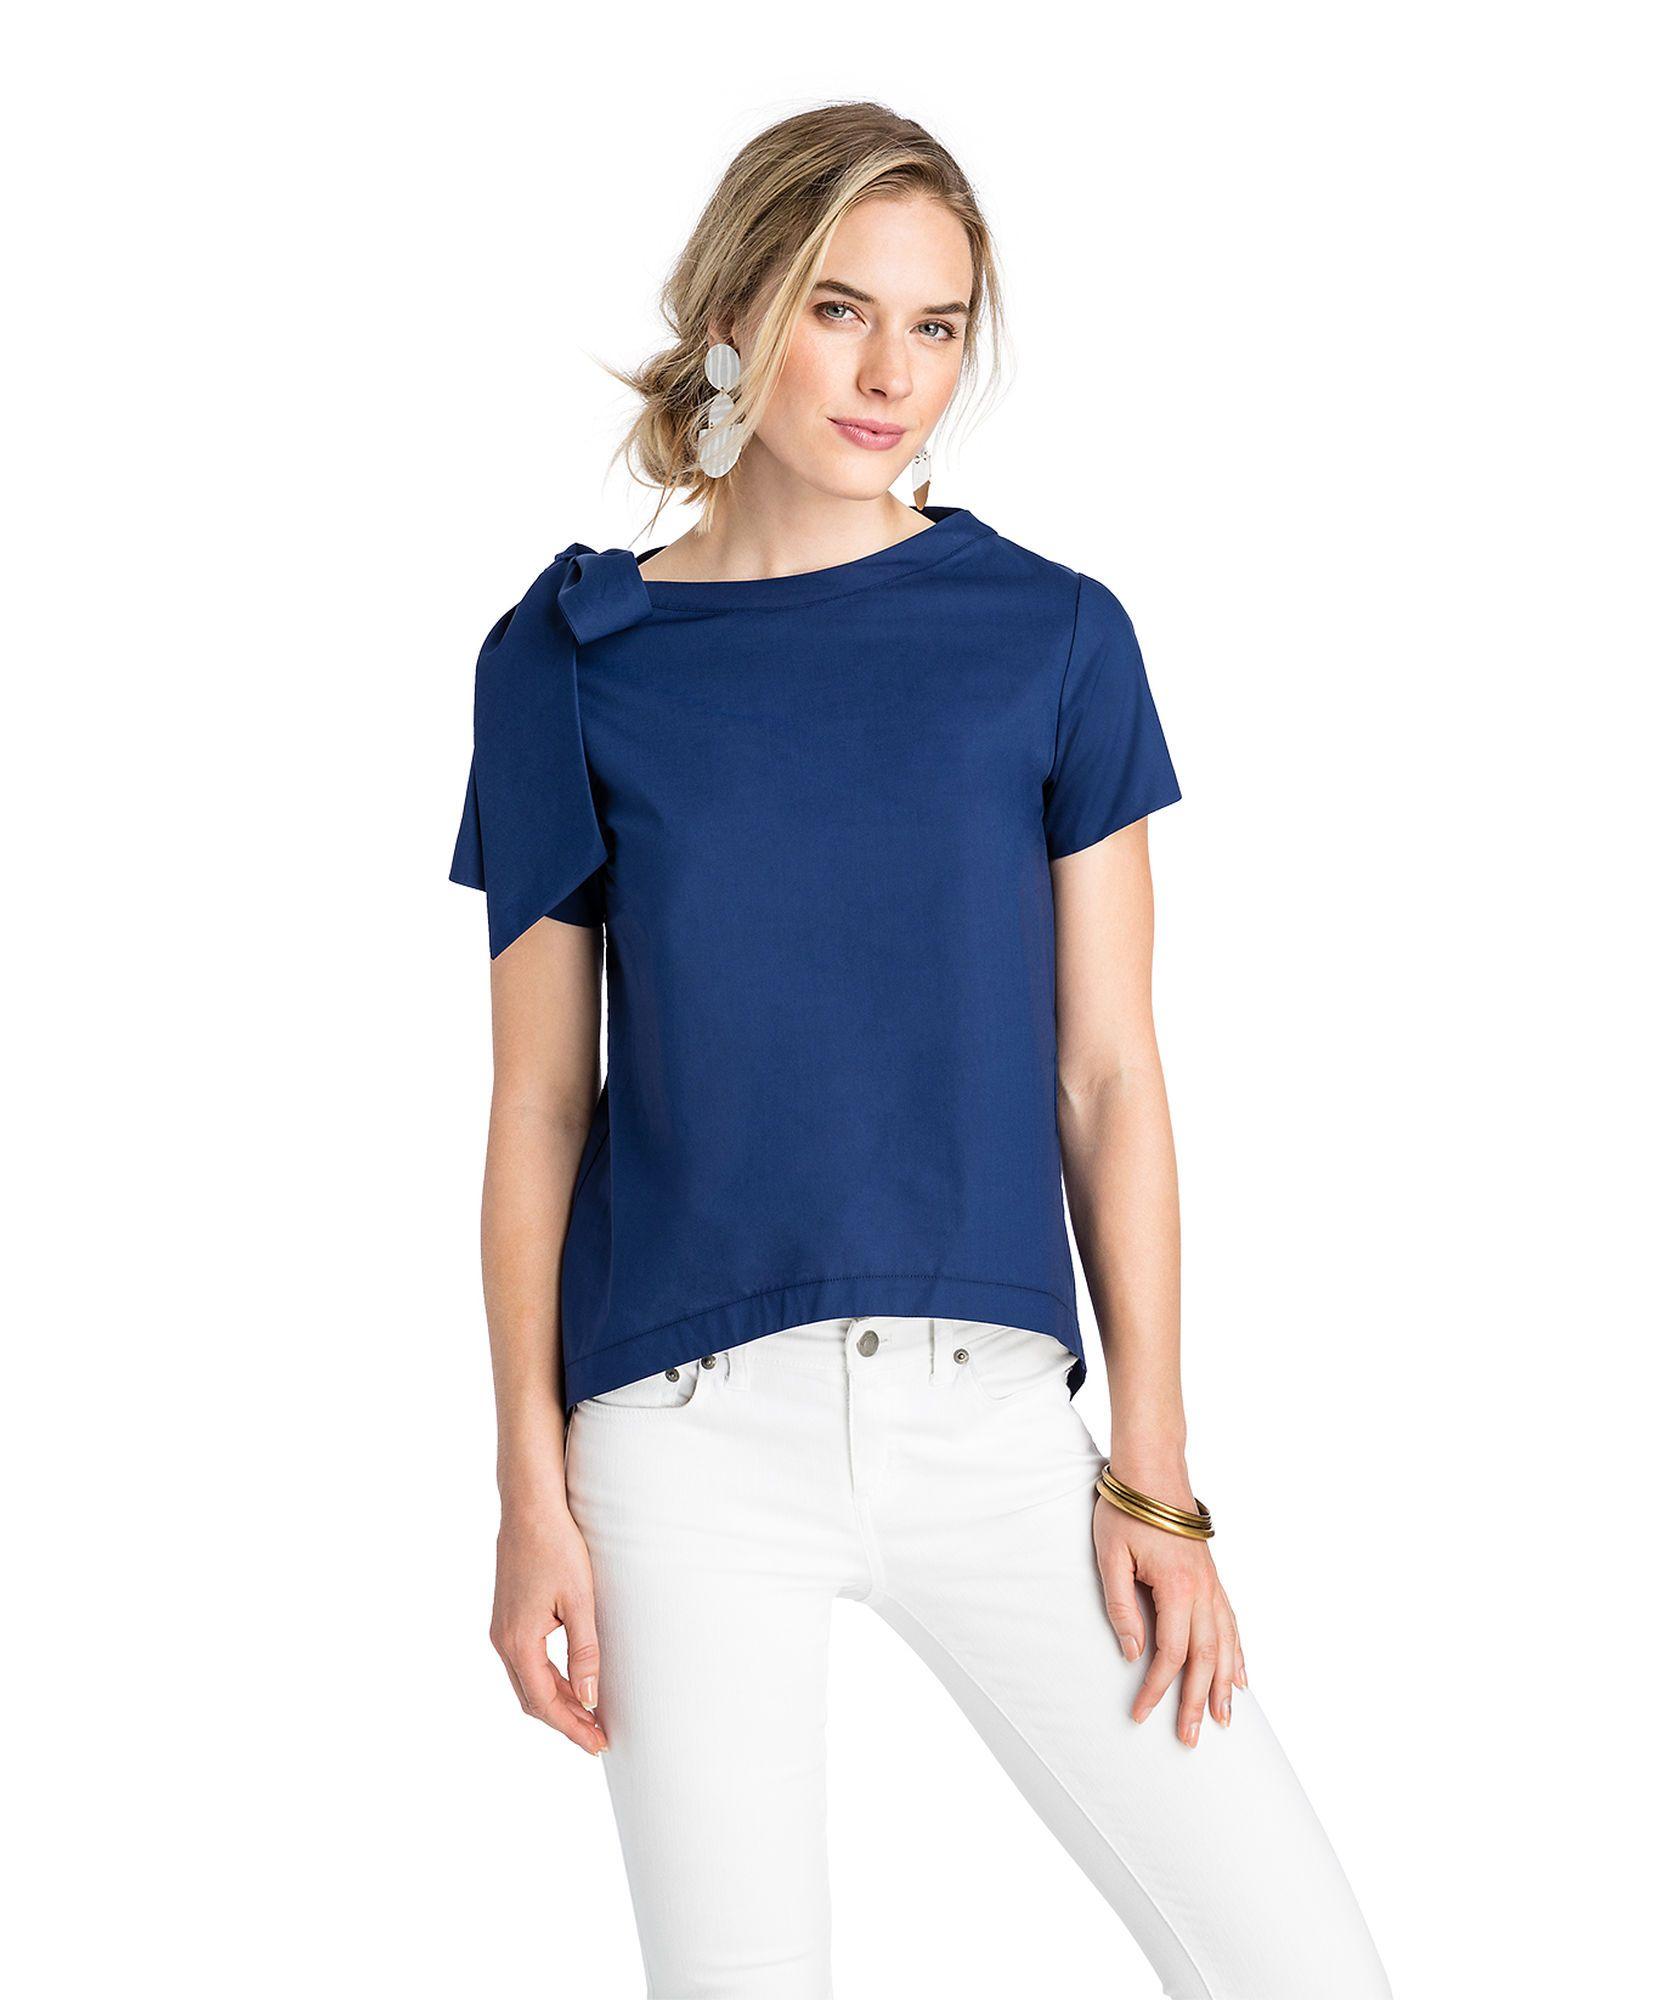 9194a94e64ba Short-Sleeve Bow Neck Top   Fashion File   Tops, One shoulder tops ...